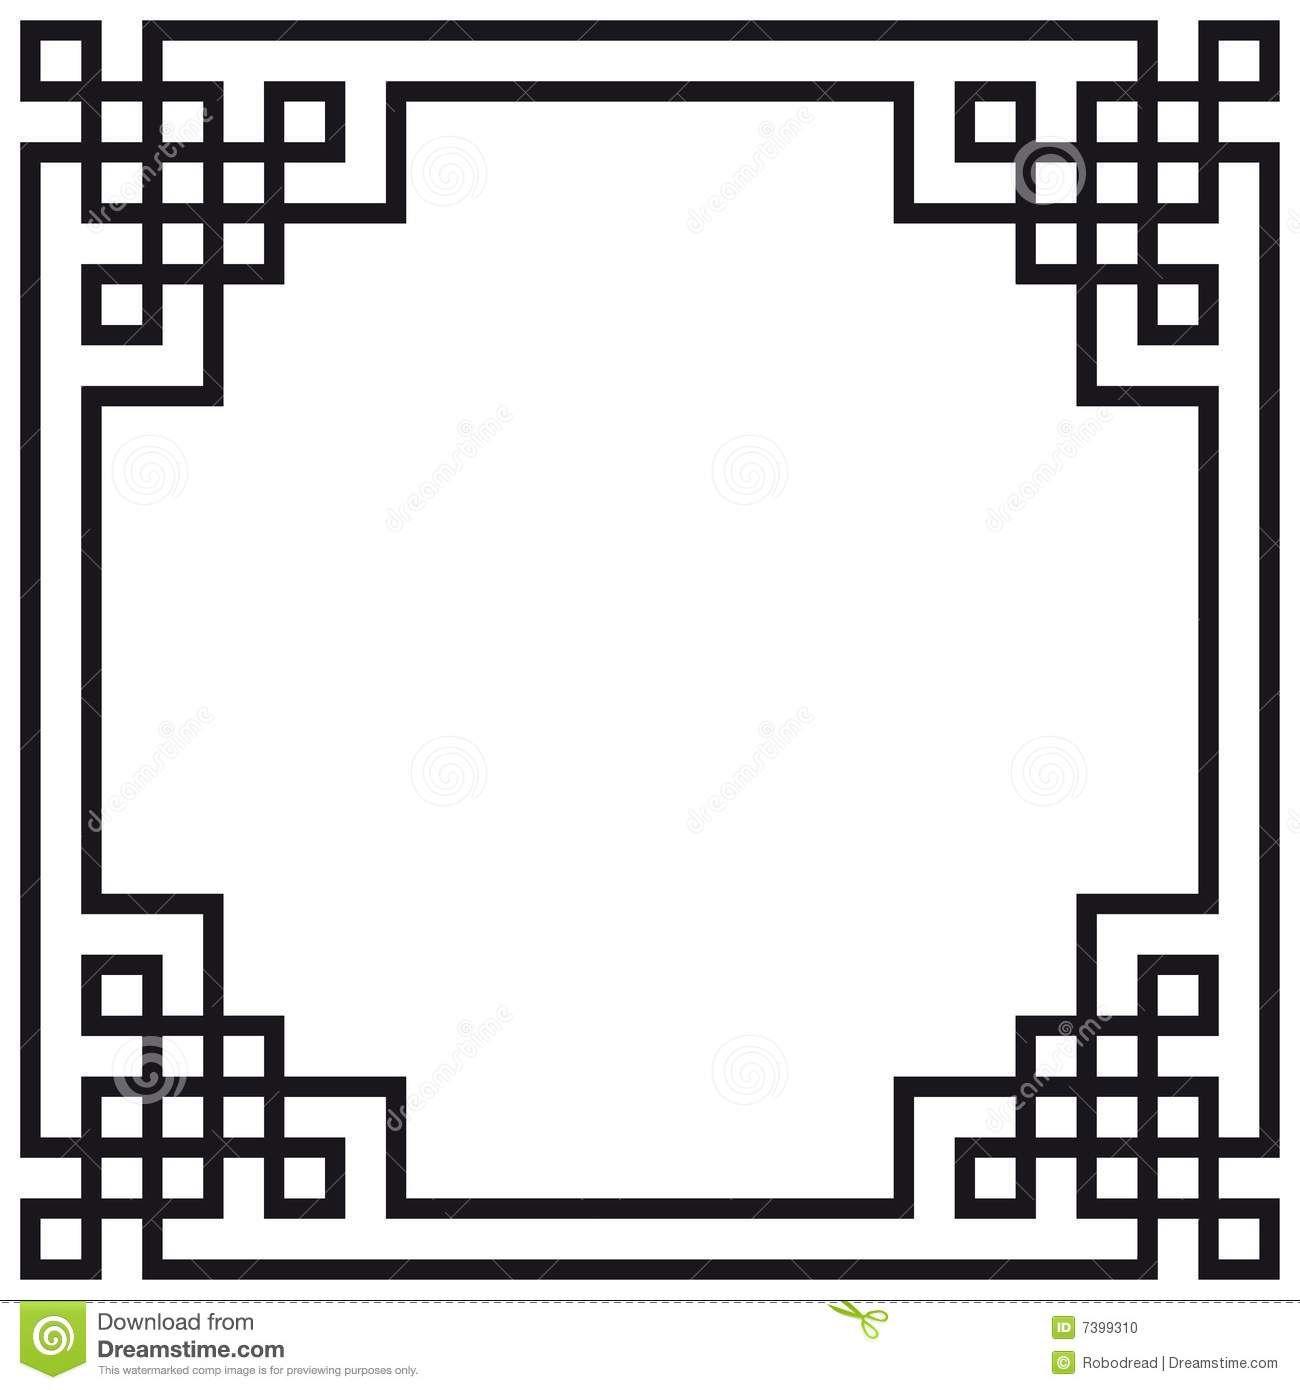 Bing basket weave border clipart library art deco borders - Google Search | Art Deco | Art deco borders, Art ... library